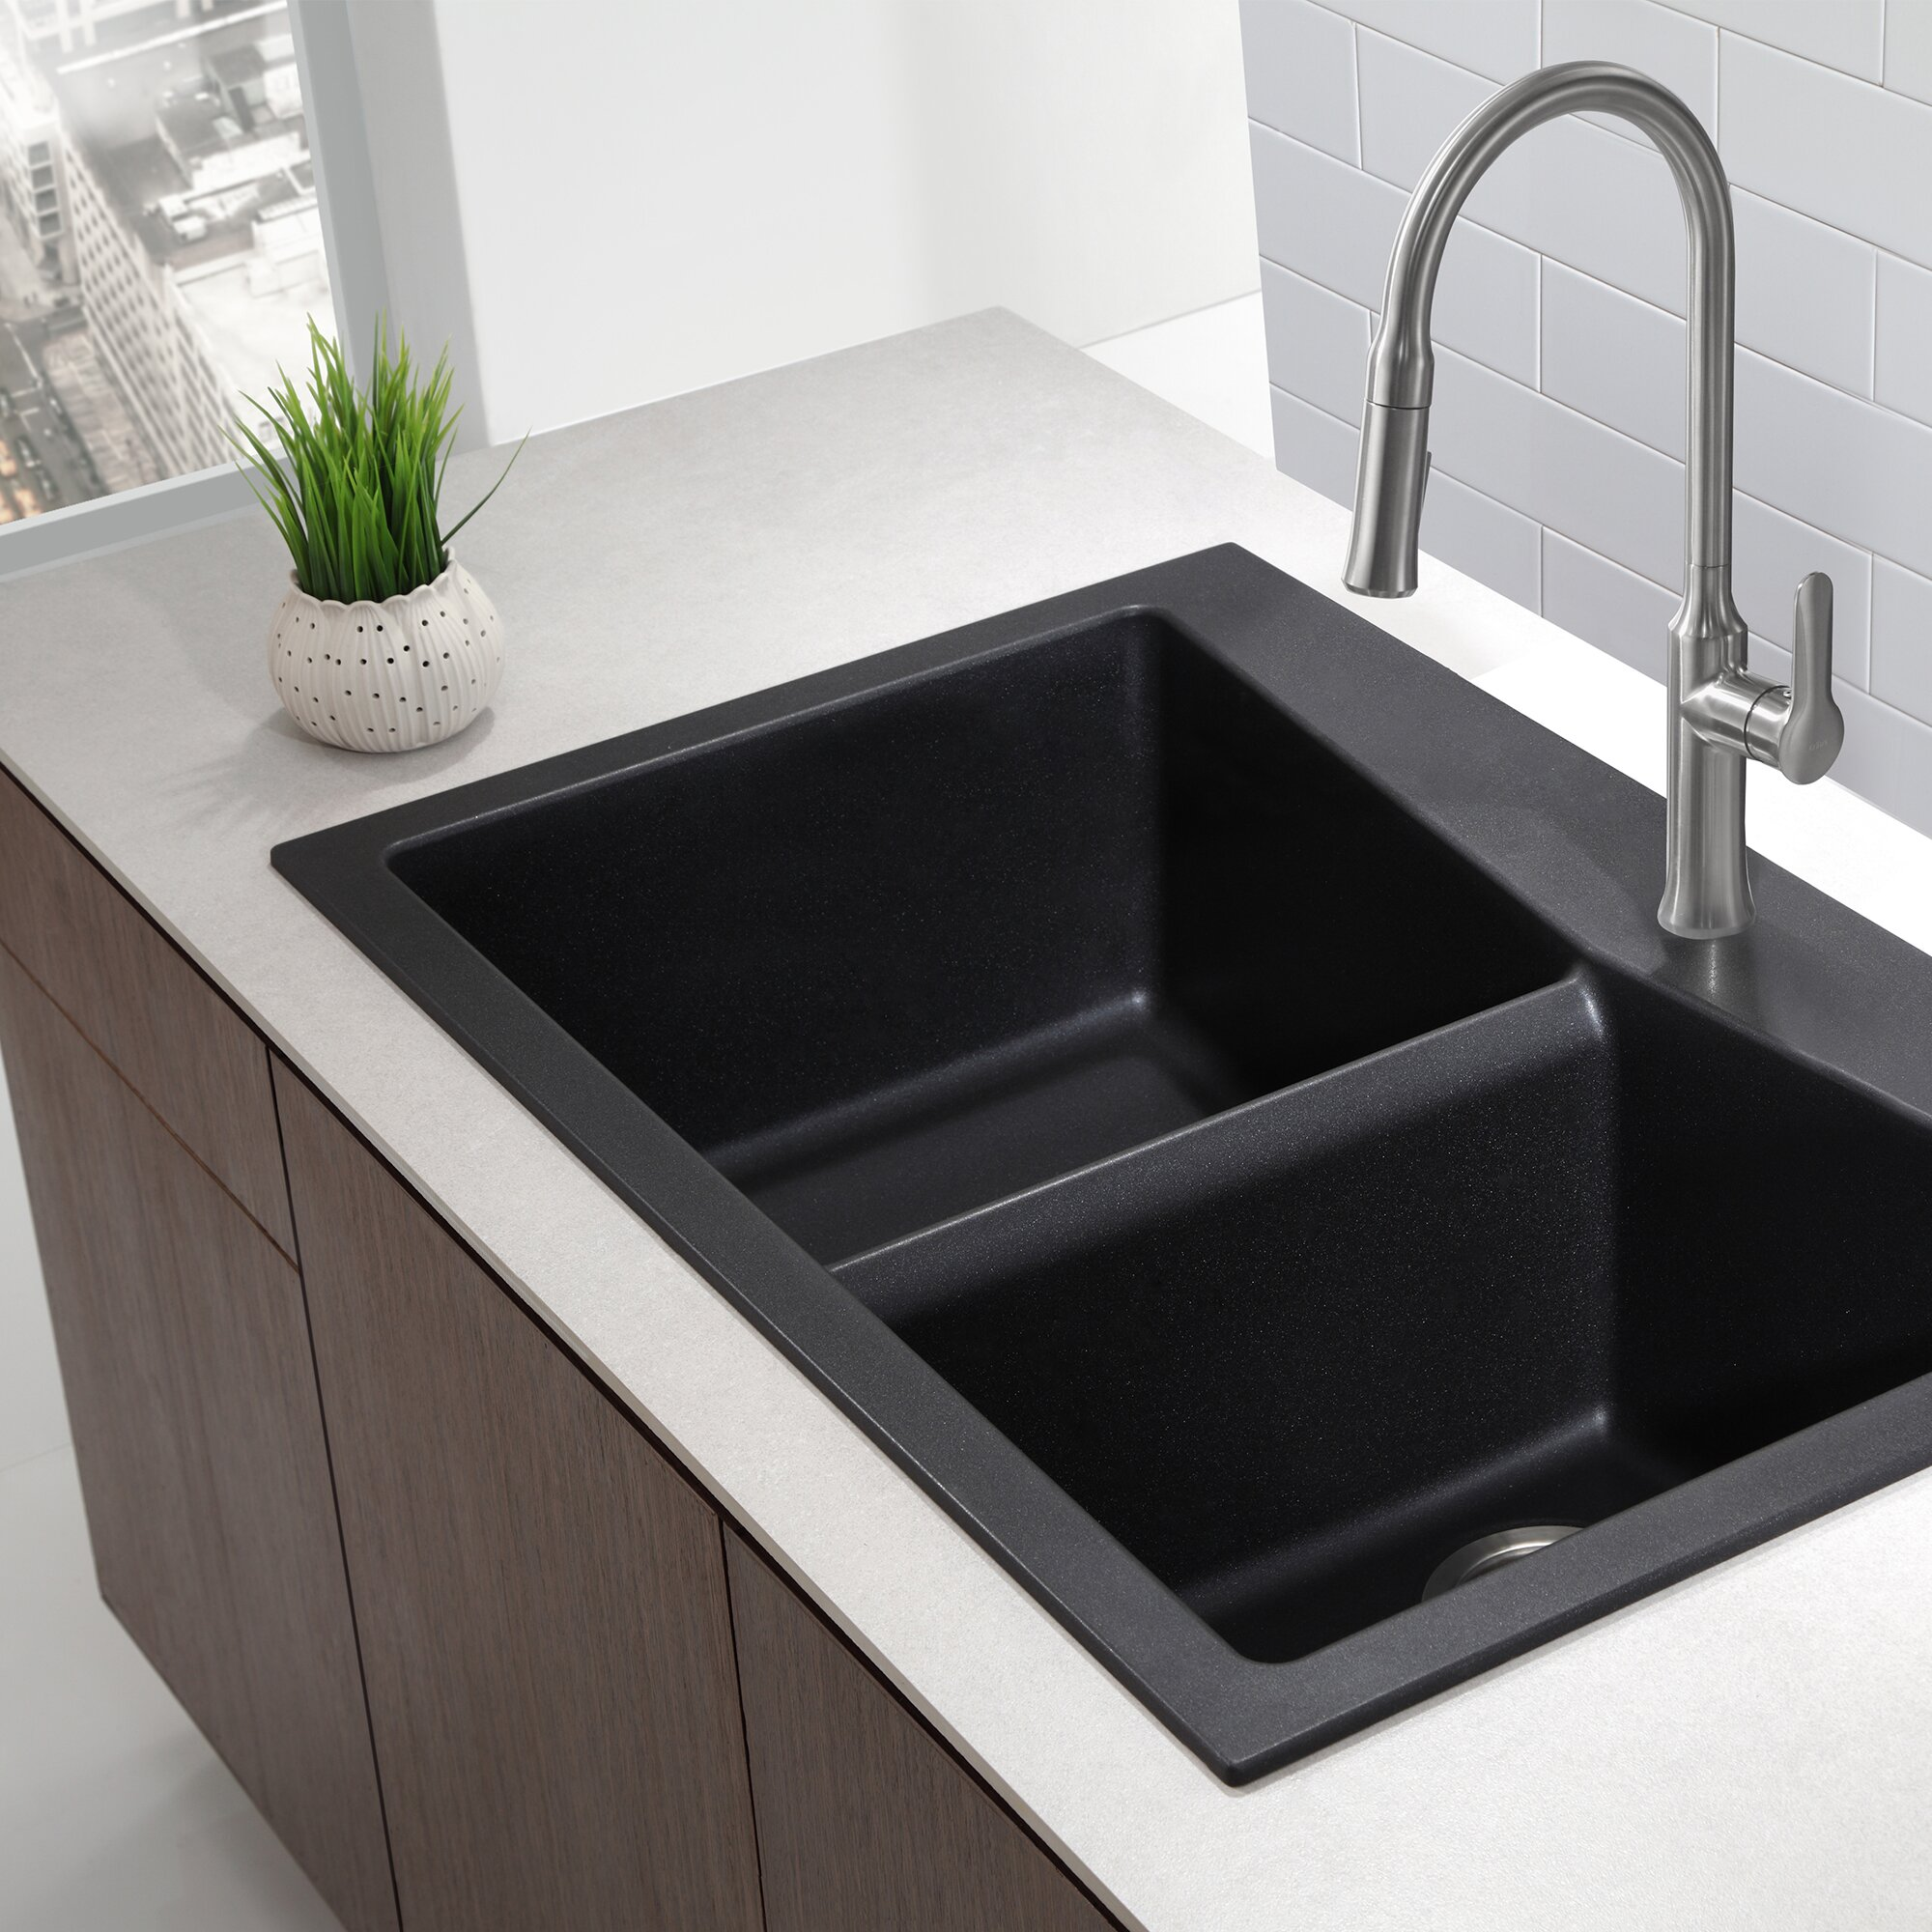 Granite Kitchen Sinks : ... Dual Mount 60/40 Double Bowl Granite Kitchen Sink & Reviews Wayfair